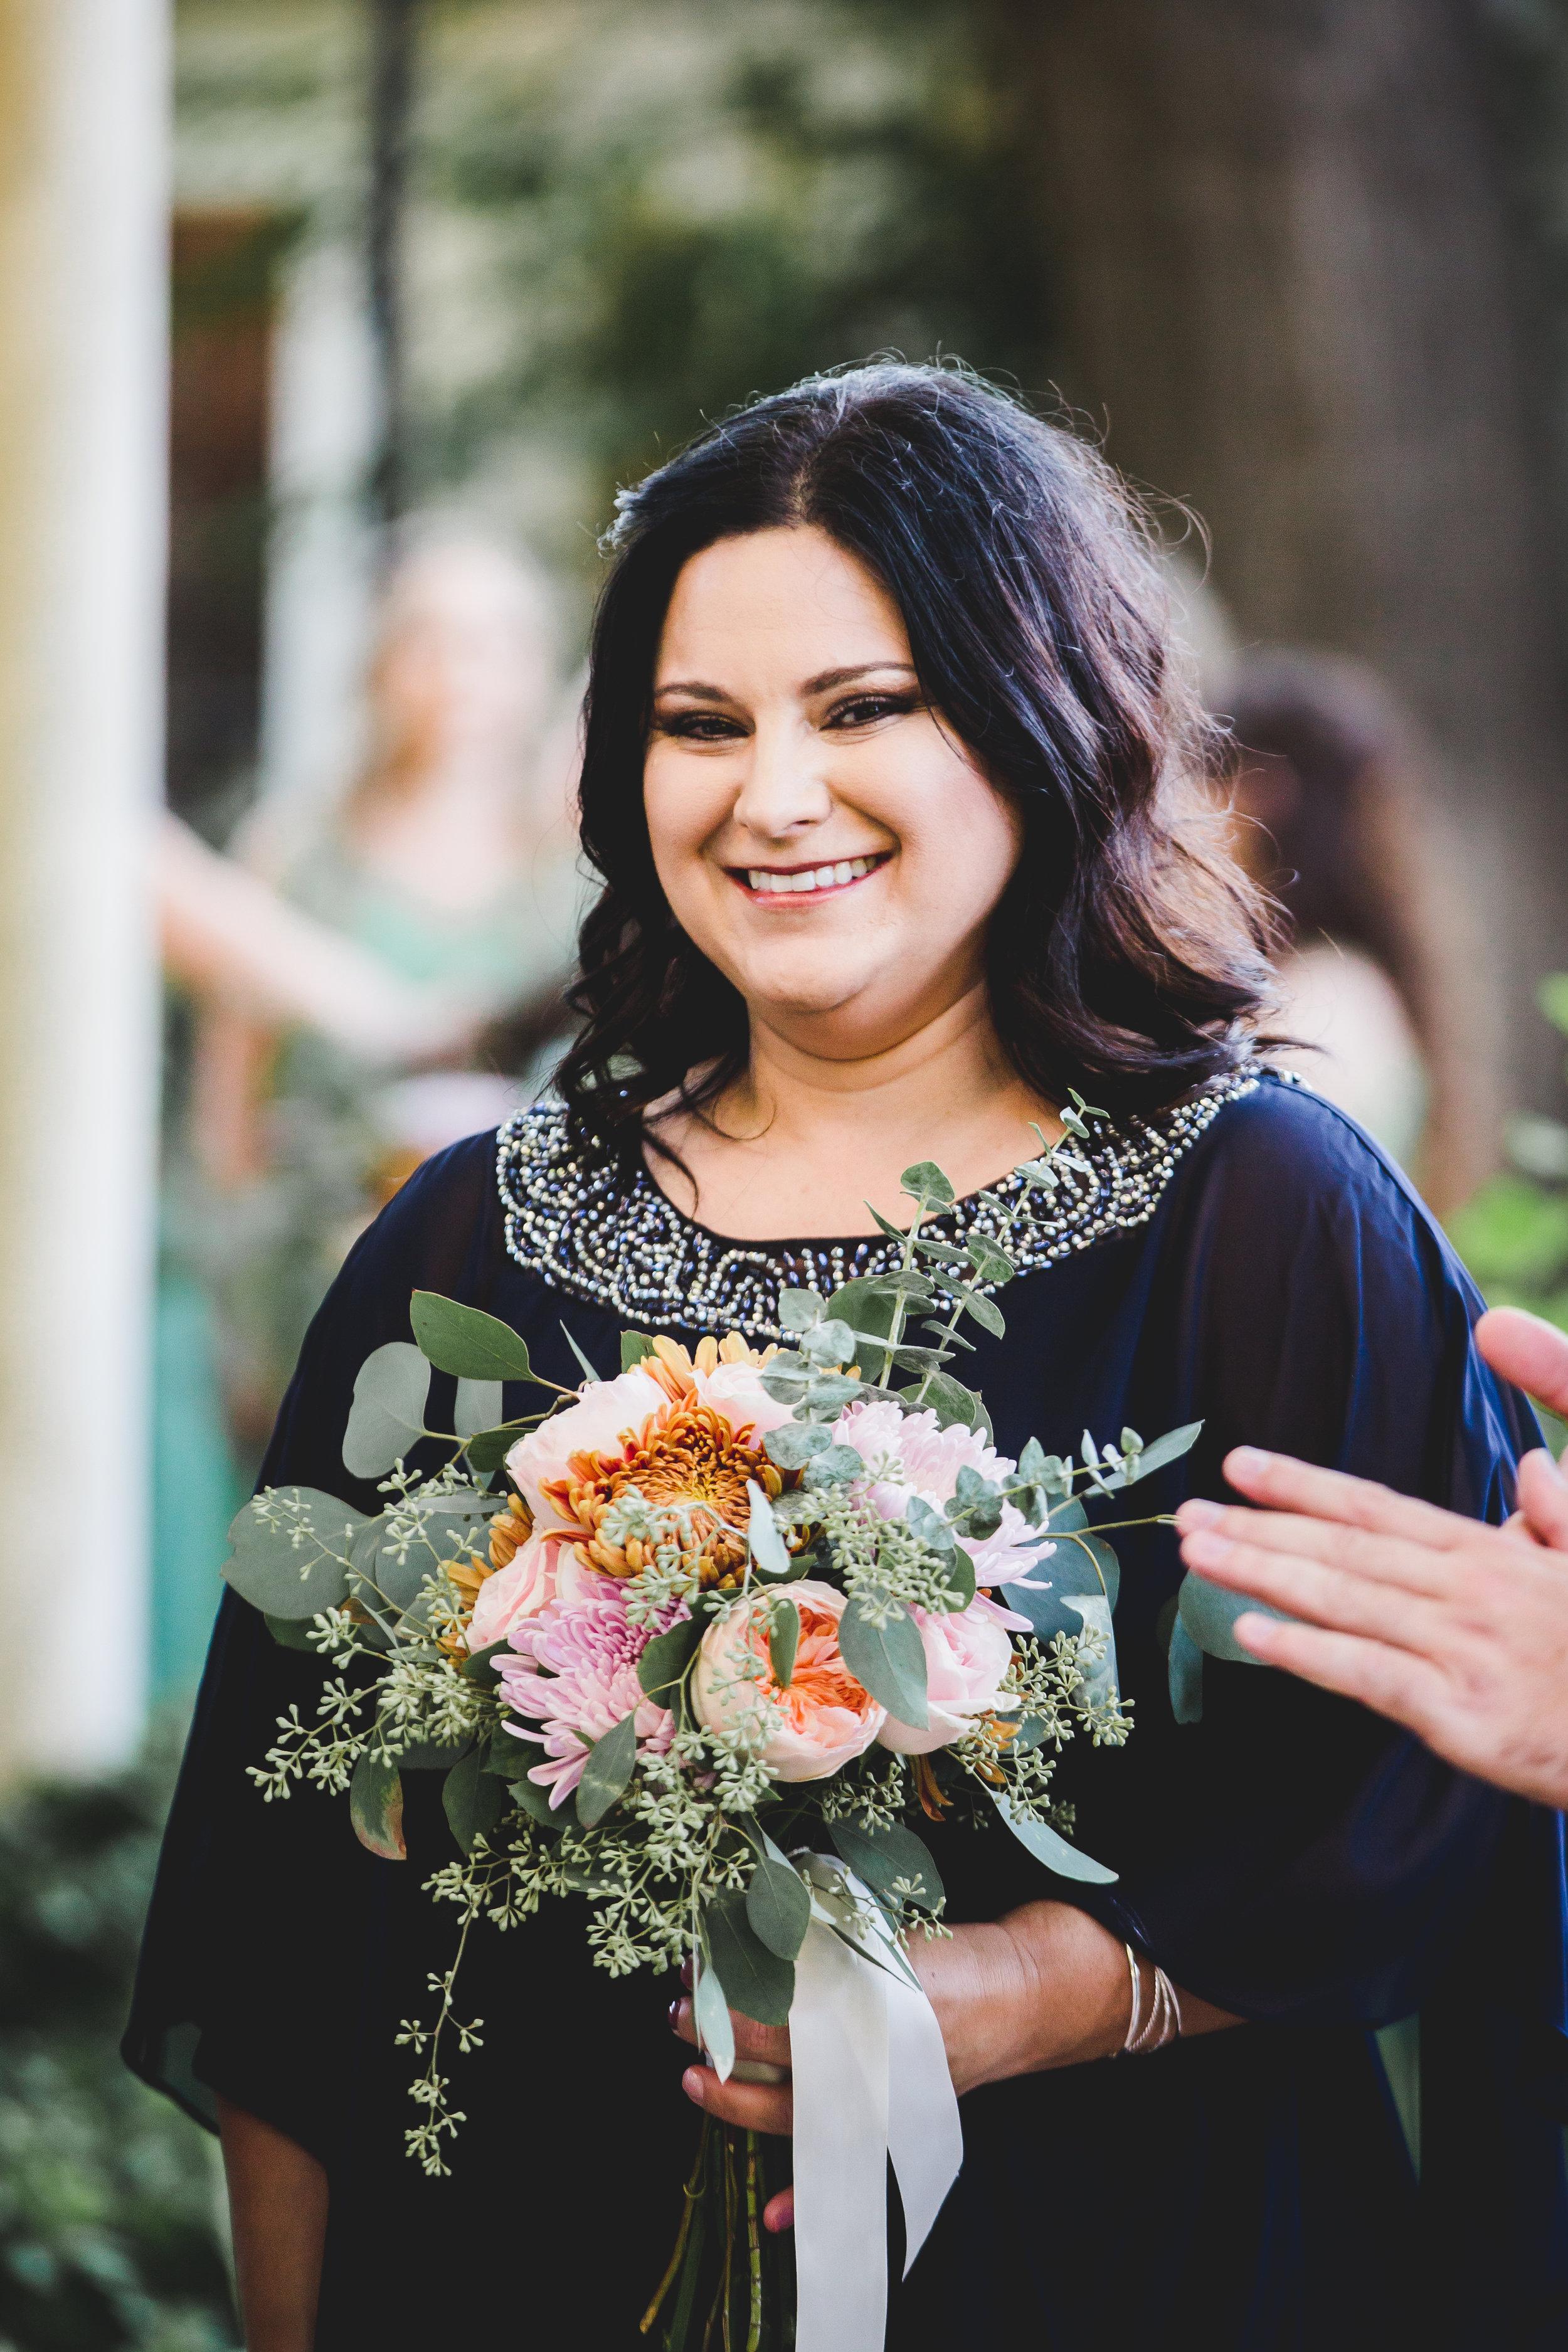 2018-09-07-WEDDING-MCBRIDE-TERRY-116.jpg